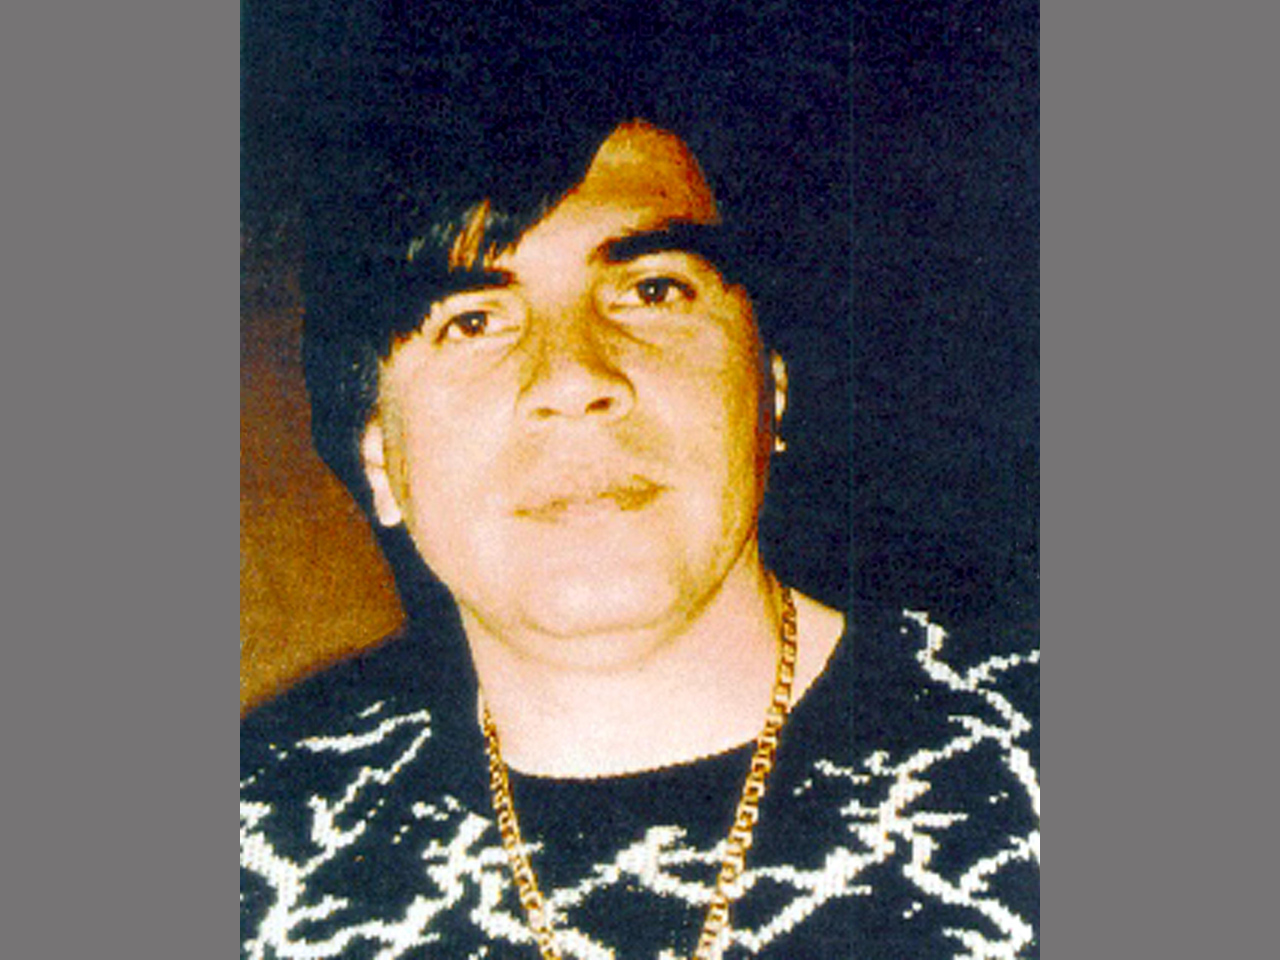 Tijuana cartel leader Arellano Felix gets 25 yrs - CBS News